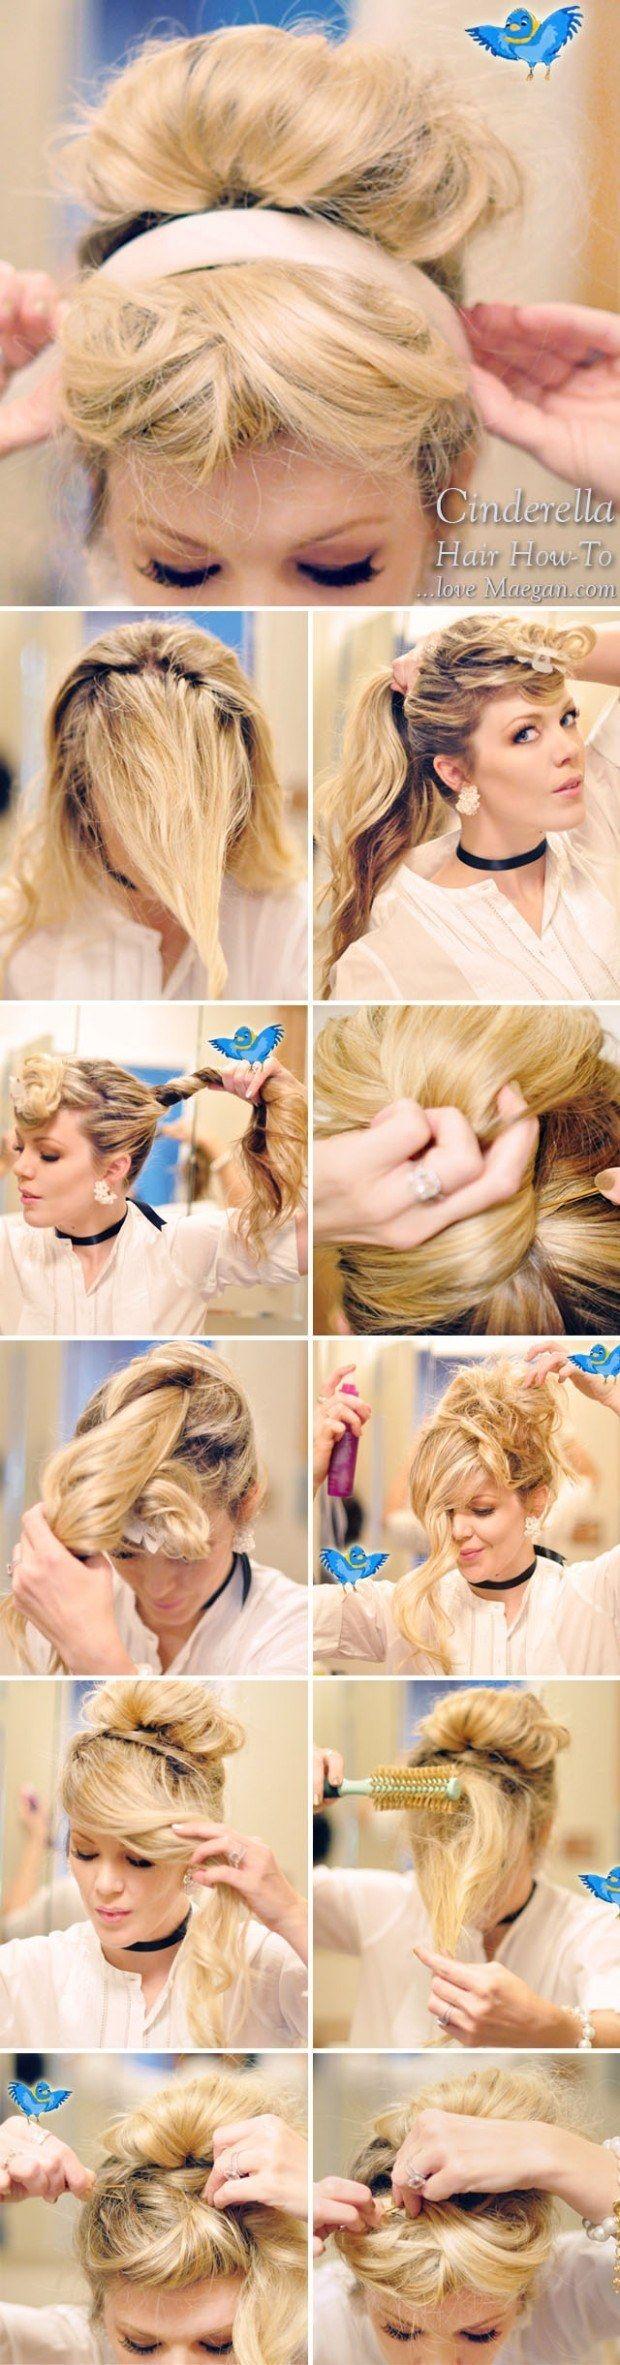 12 Easy Hair Tutorials Even Disney Princesses Would Envy  Hair